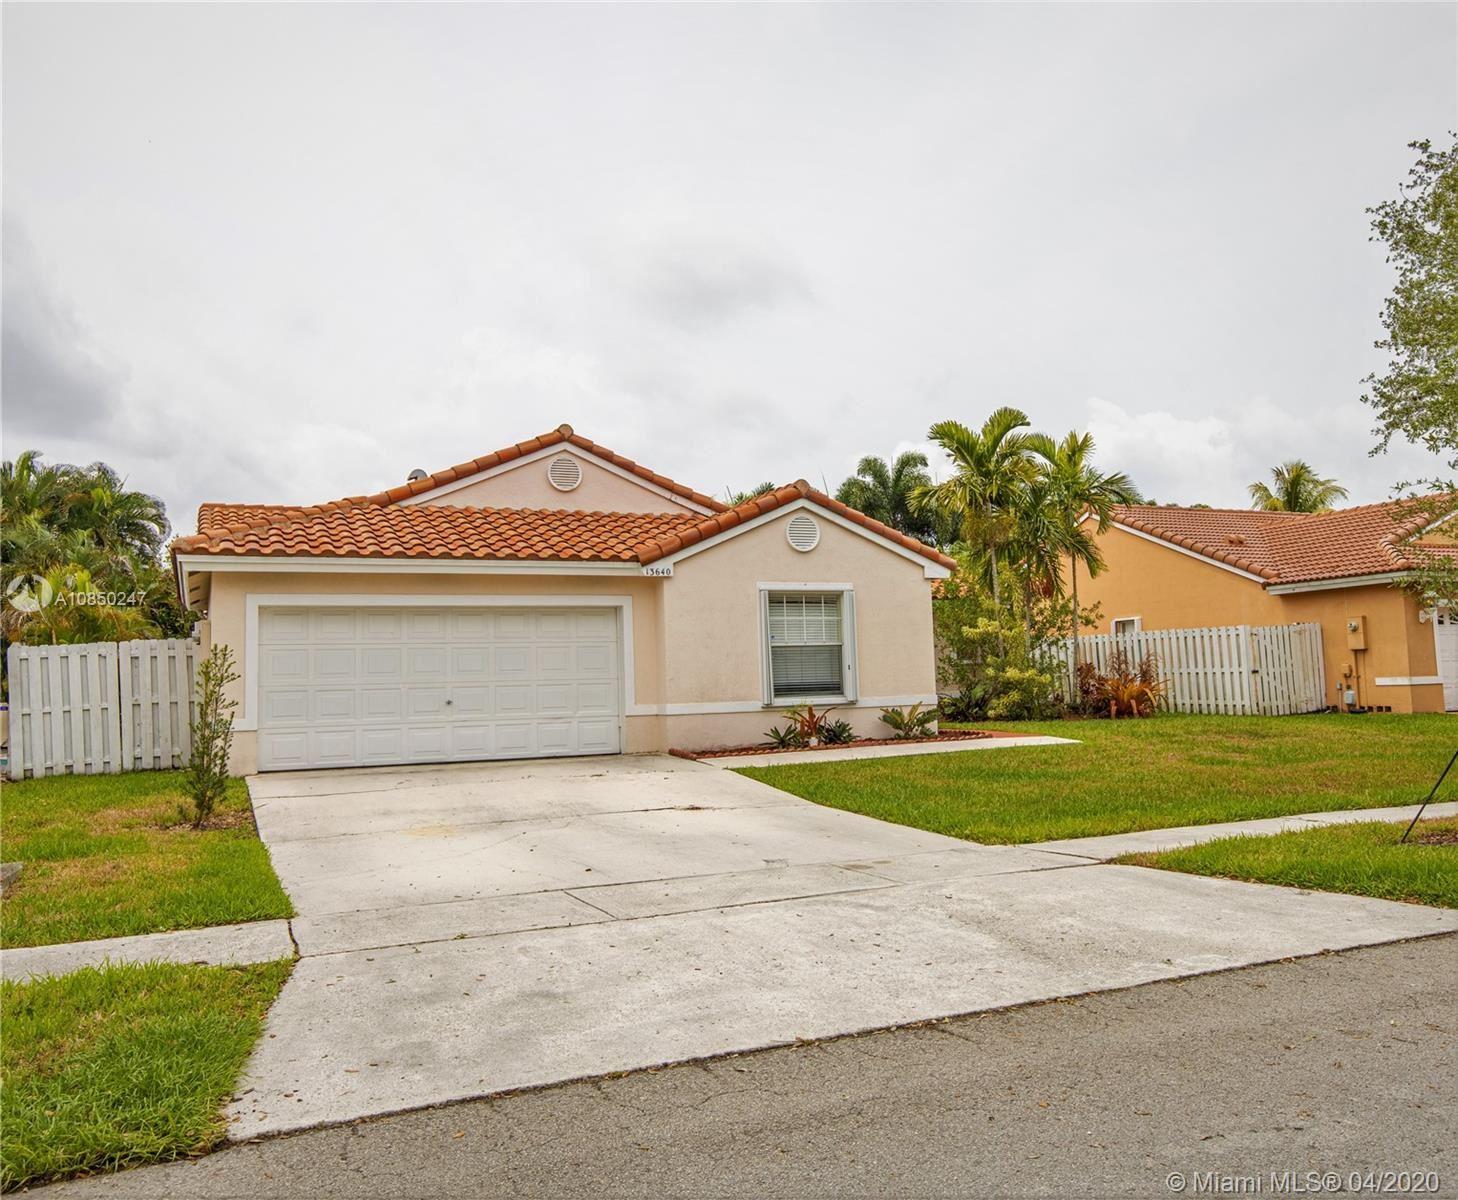 13640 SW 20th St, Miramar, FL 33027 - #: A10850247